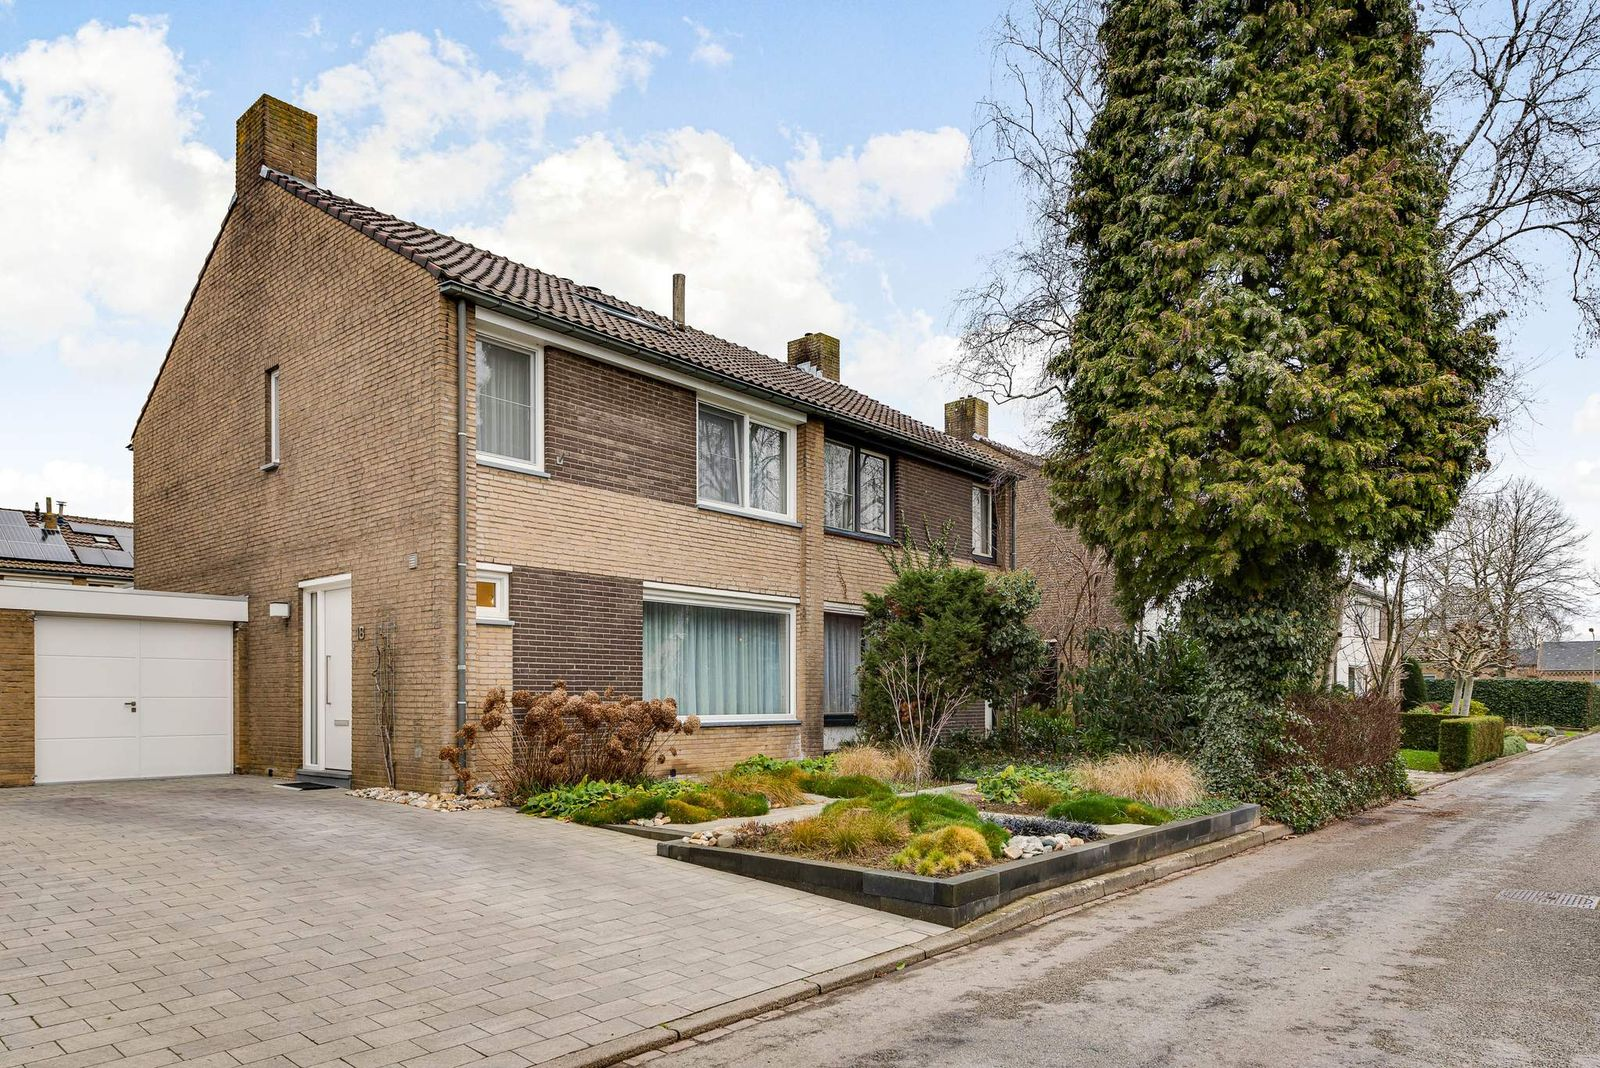 Cassedonk 18, Maastricht